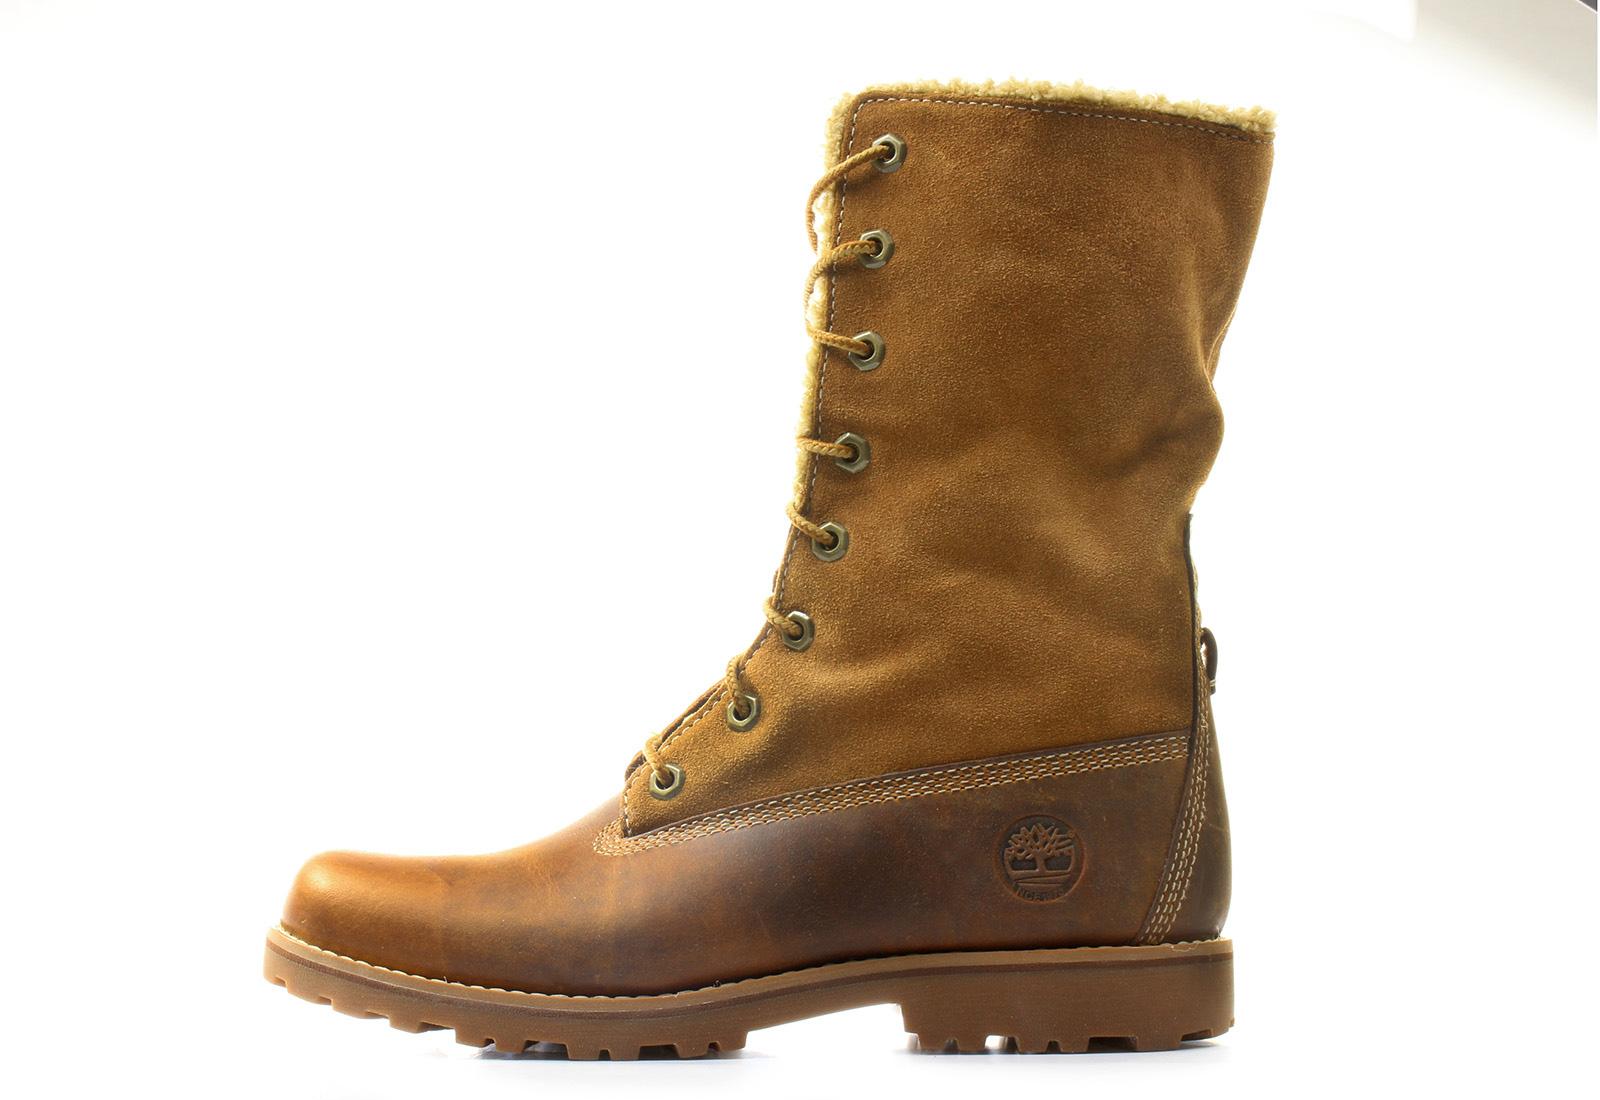 0a75bd2d0169 Timberland Topánky - 6 Inch Shrl Boot - 50919-whe - Tenisky